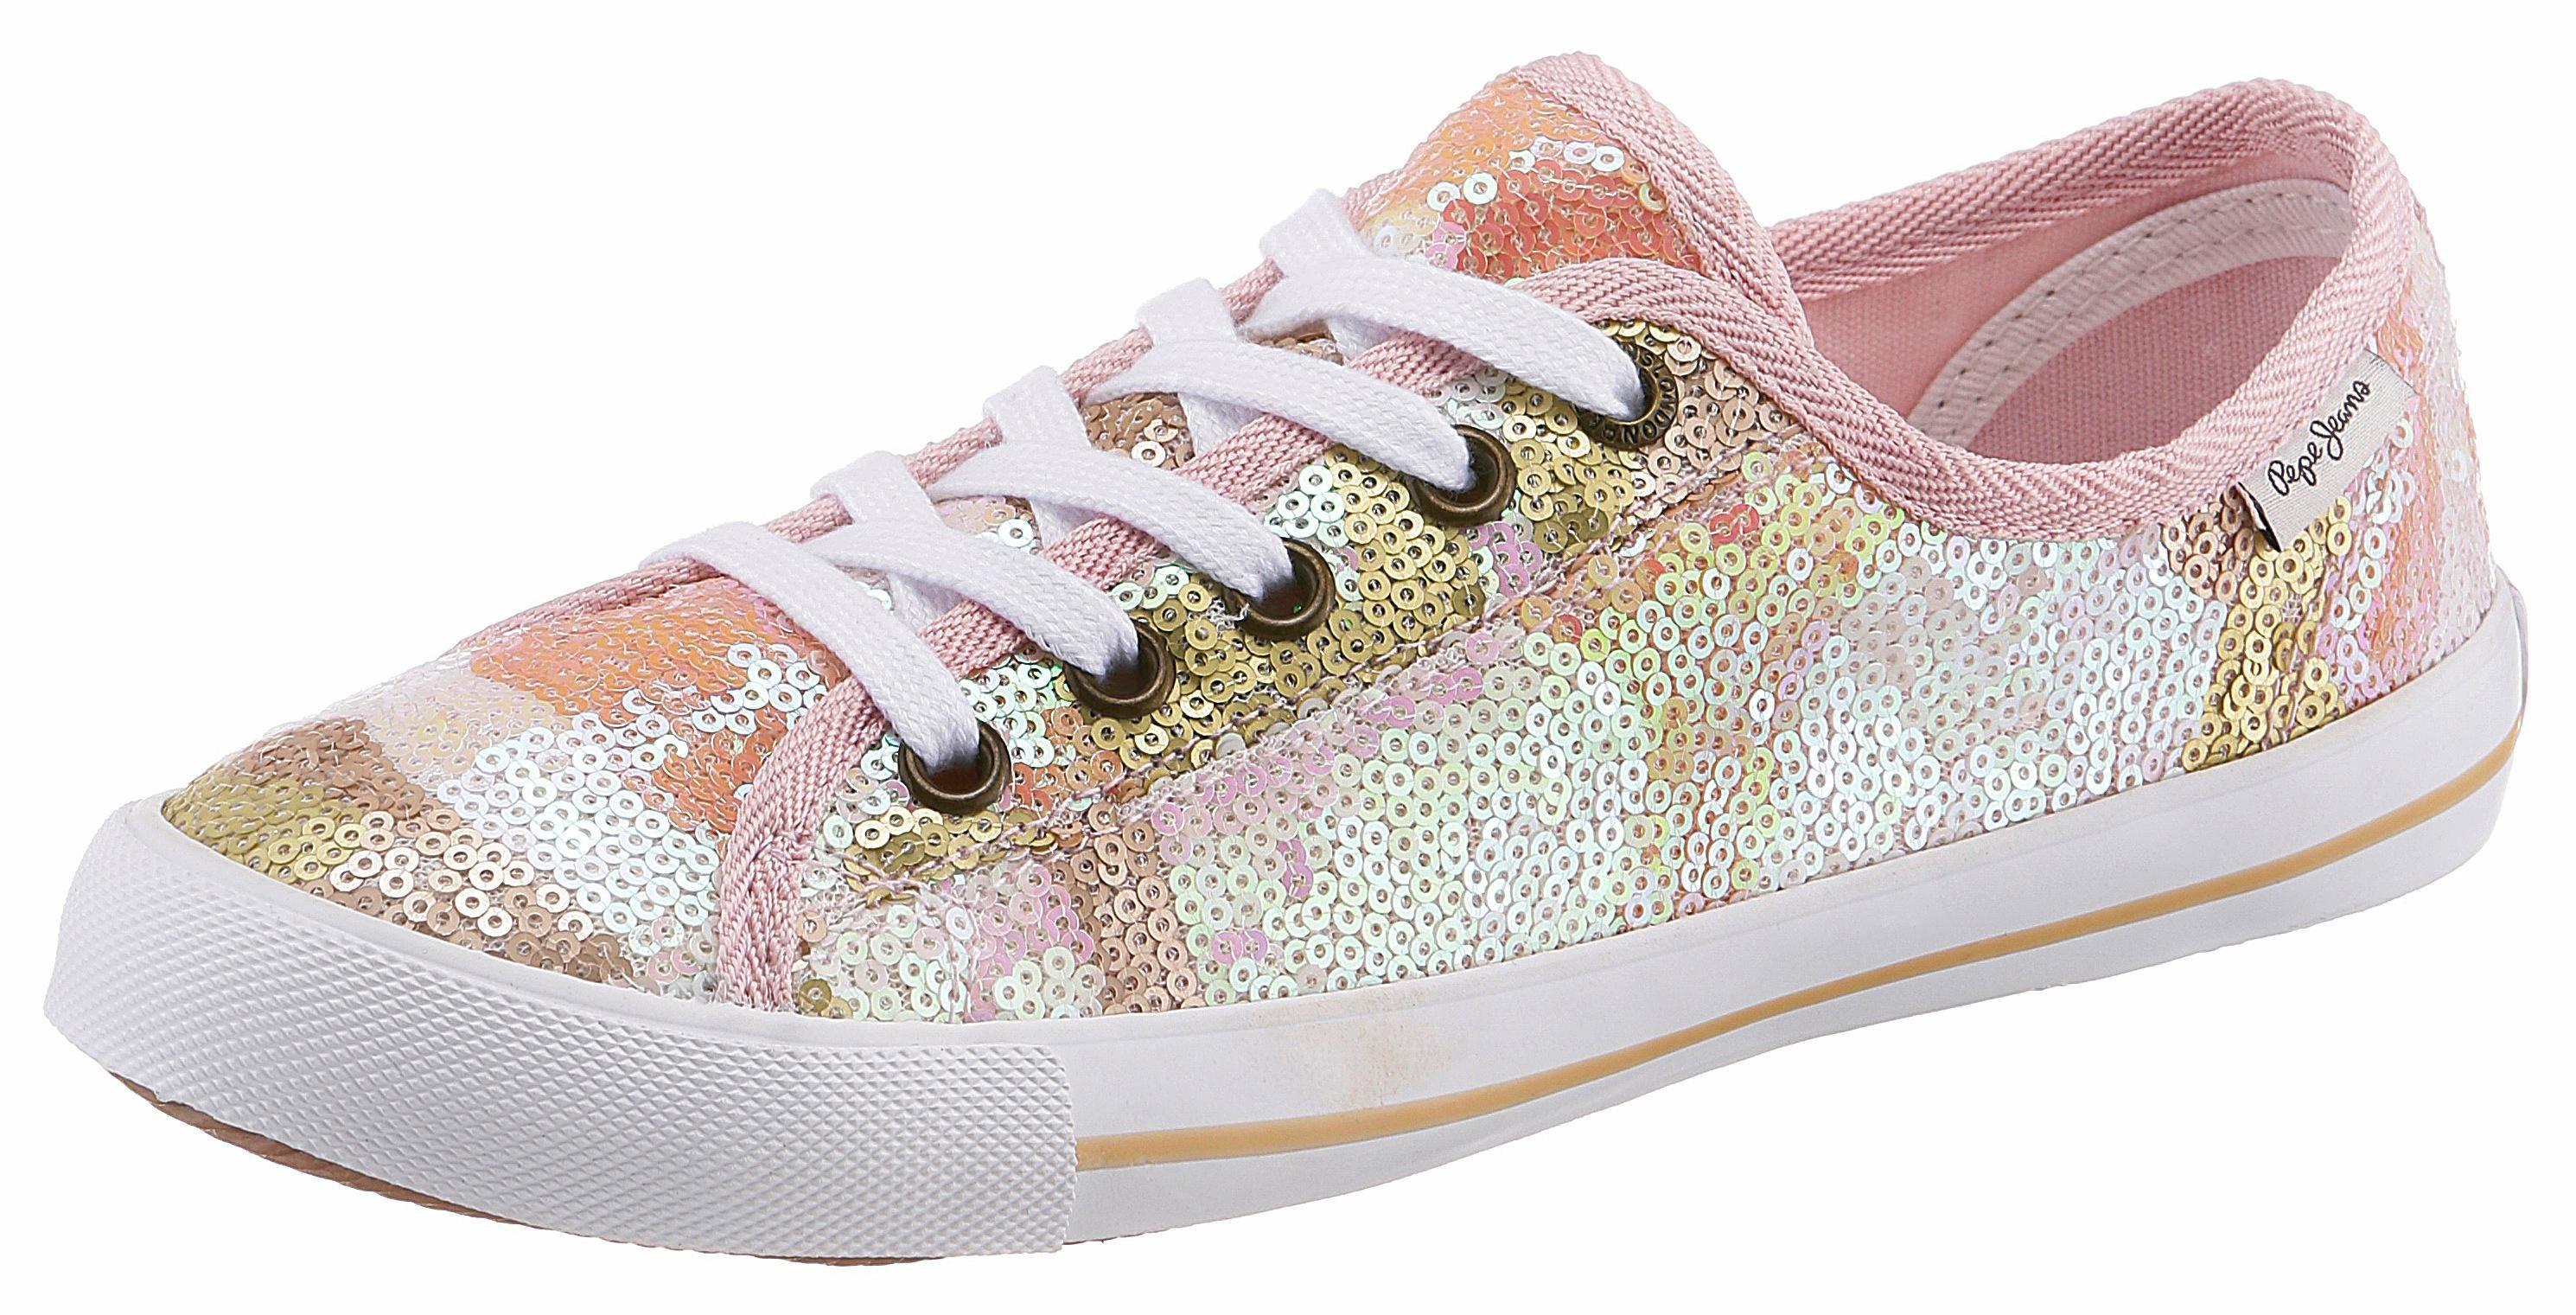 Pepe Jeans »GERY JUNGLE« Sneaker, mit Pailletten, rosa, goldfarben-rosé